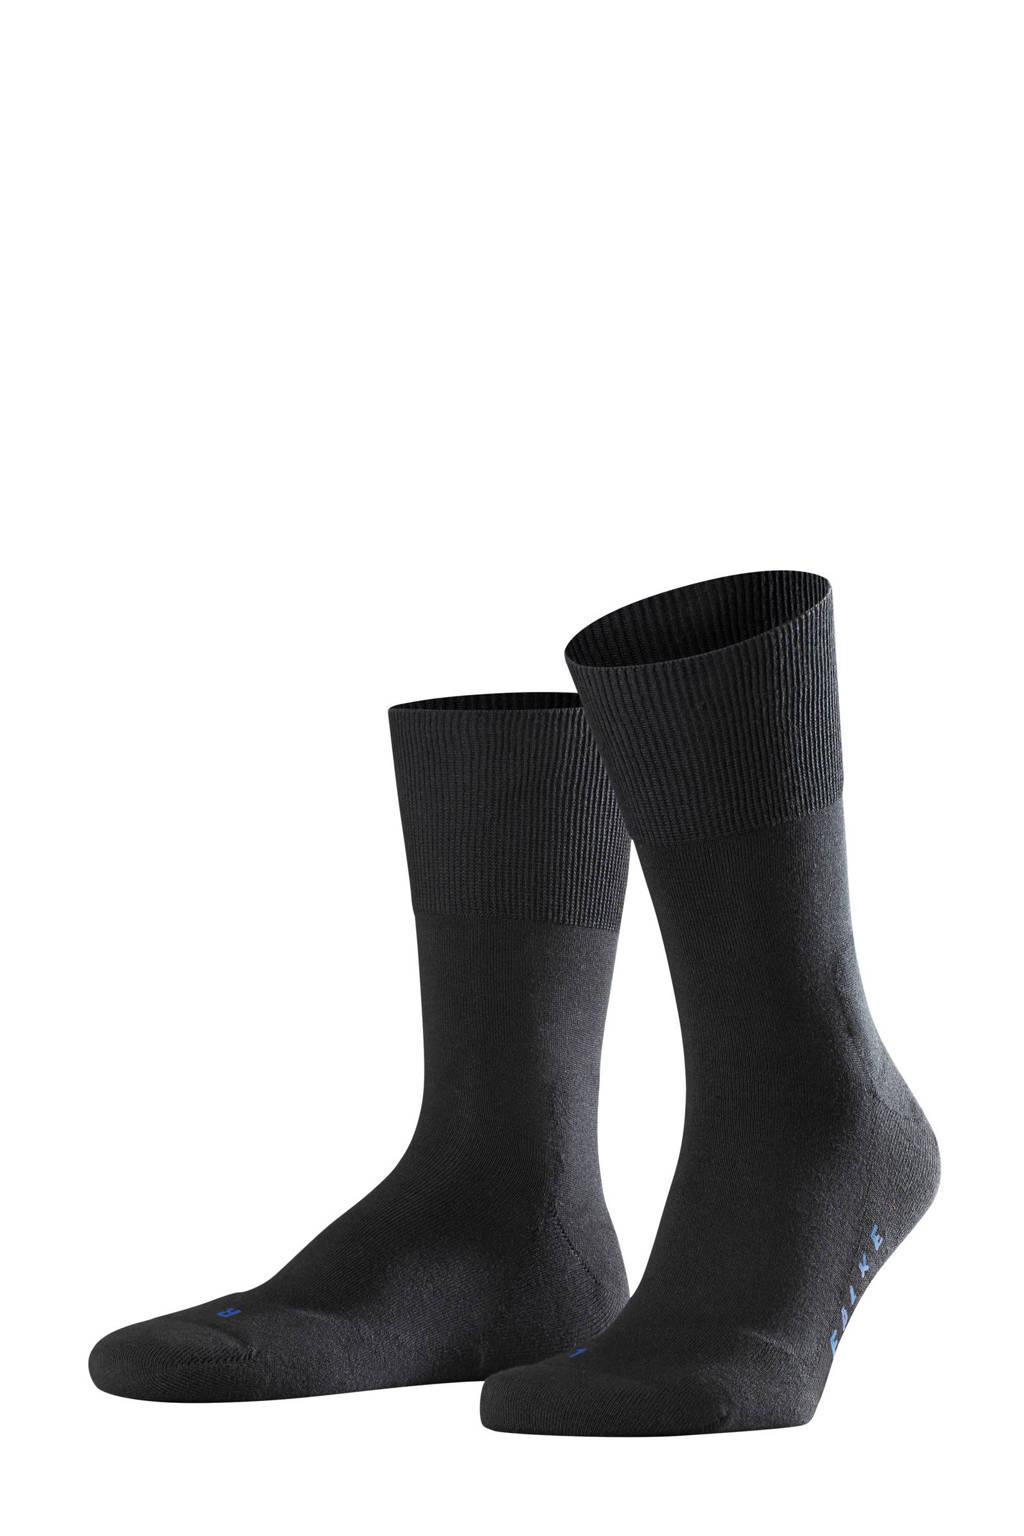 FALKE Run sokken zwart, Zwart